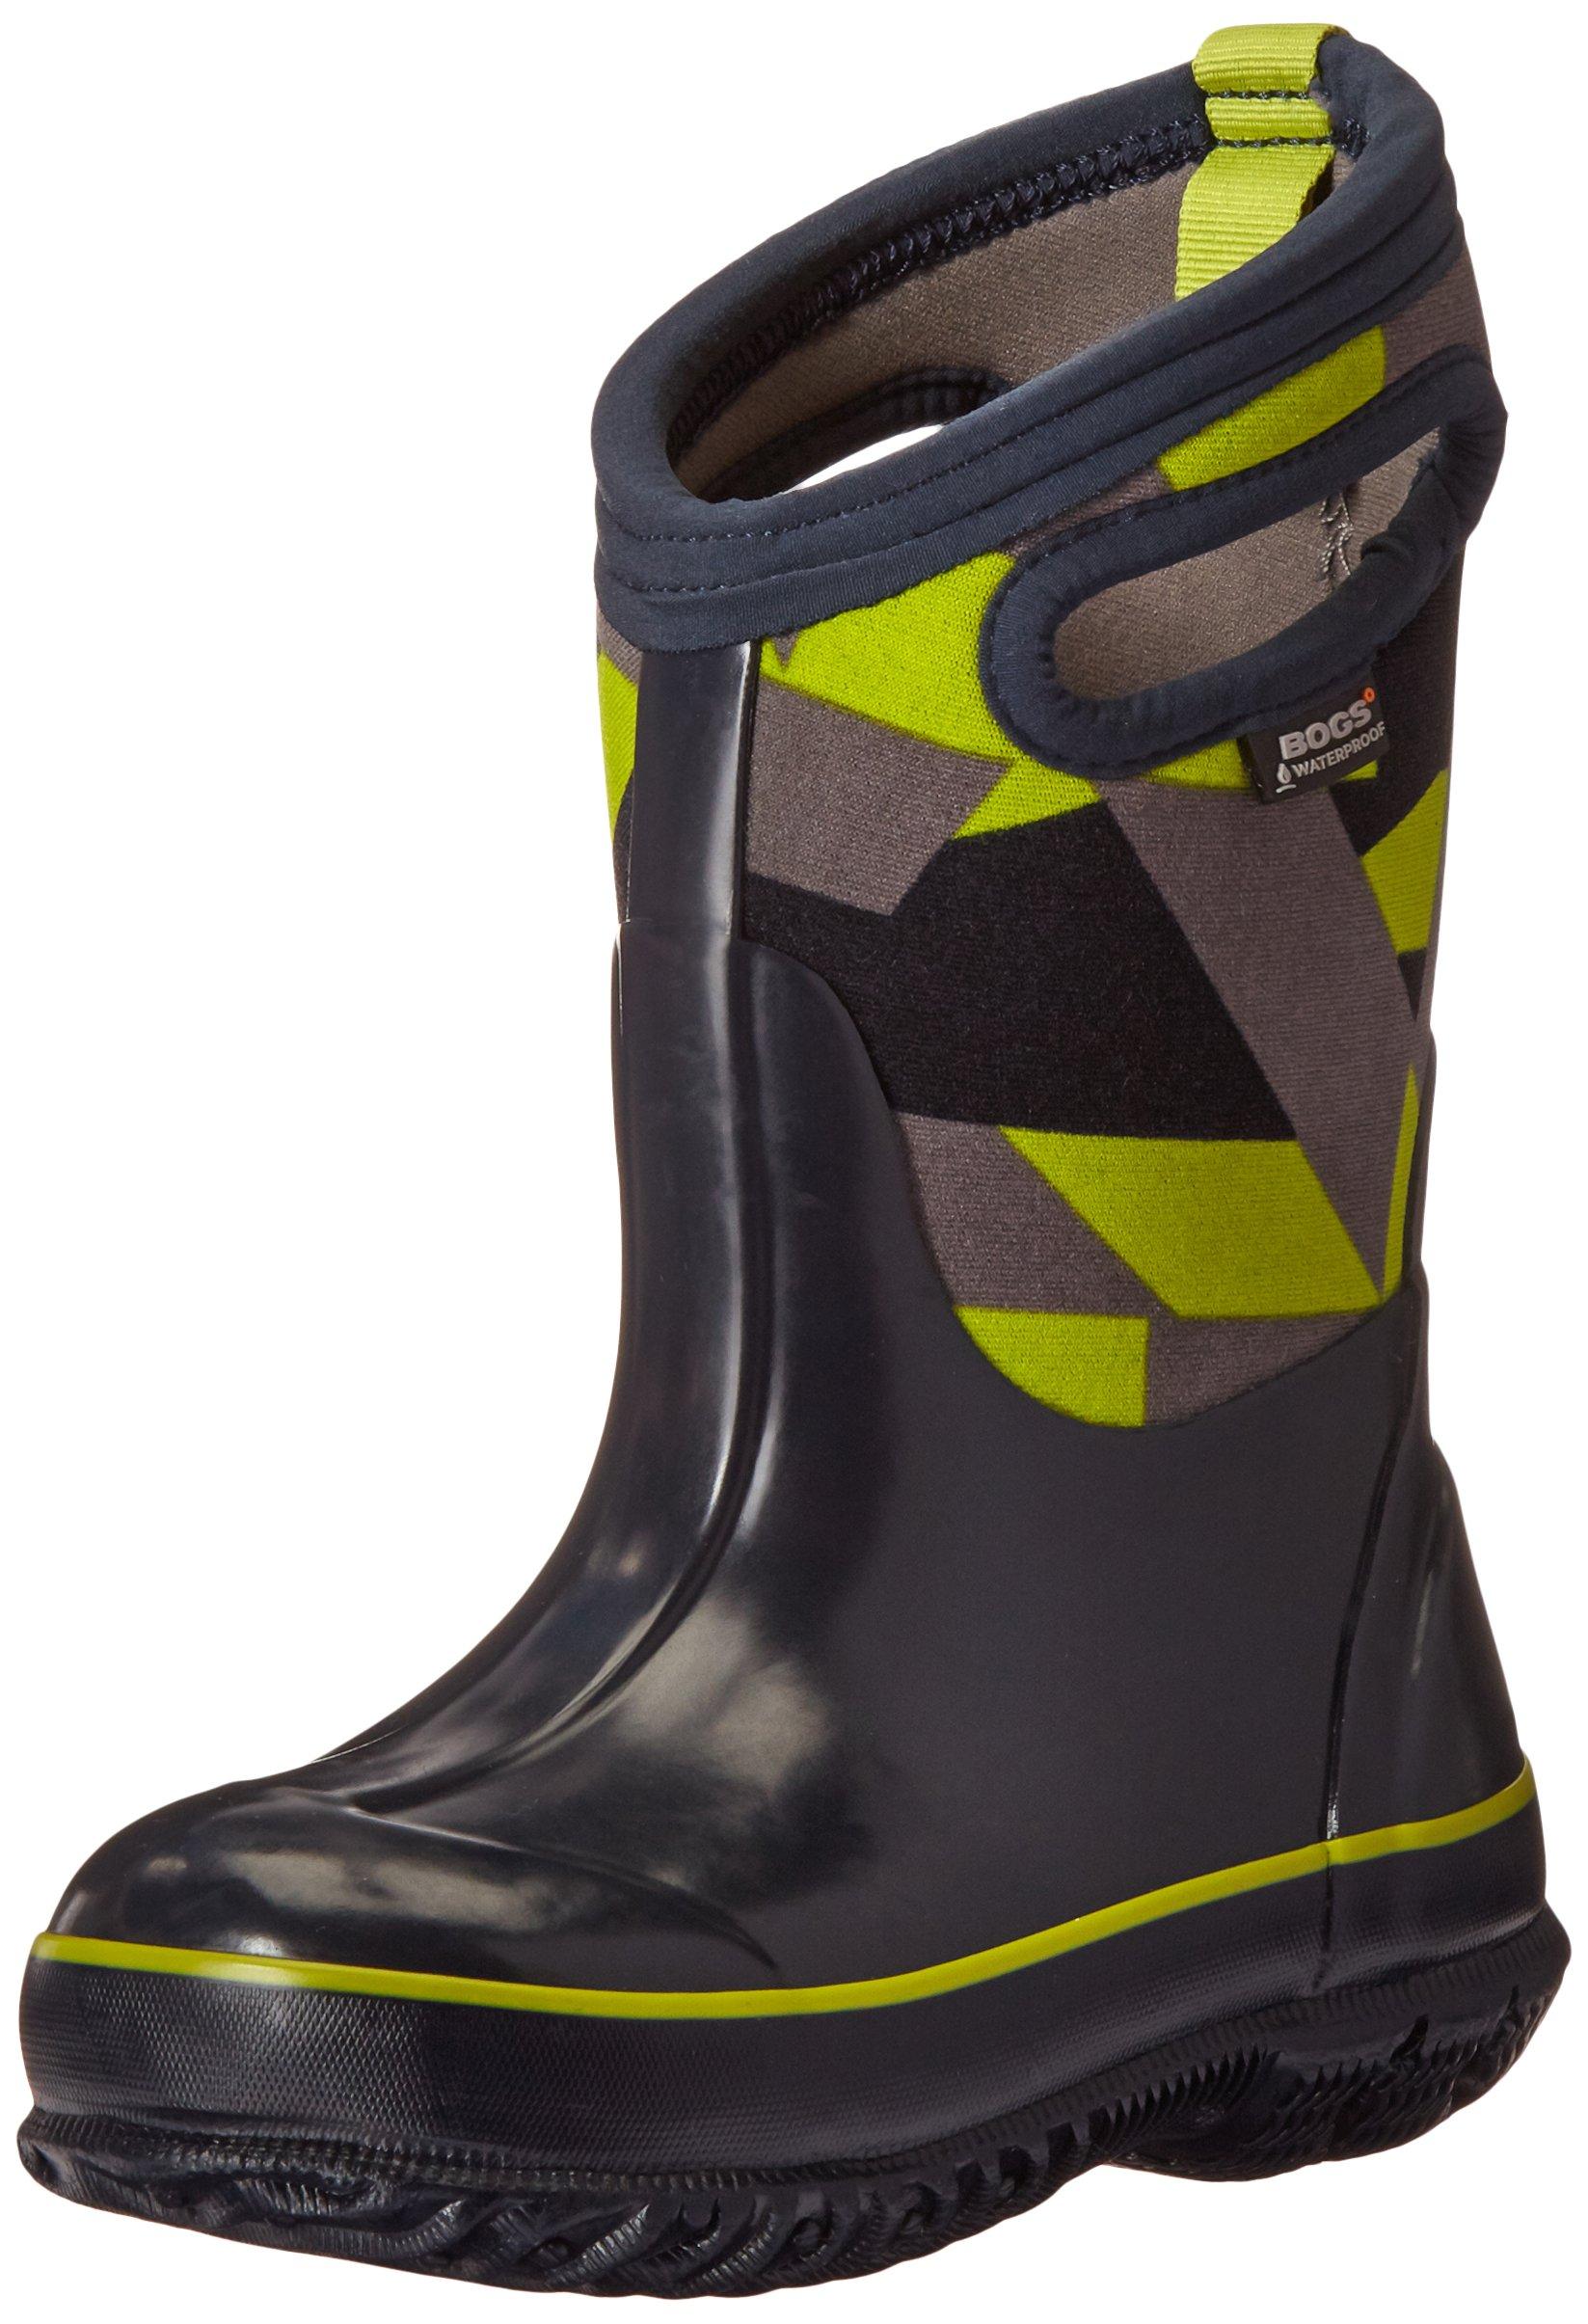 Bogs Classic High Waterproof Insulated Rubber Neoprene Rain Boot Snow, Skulls Print/Black/White, 3 M US Little Kid